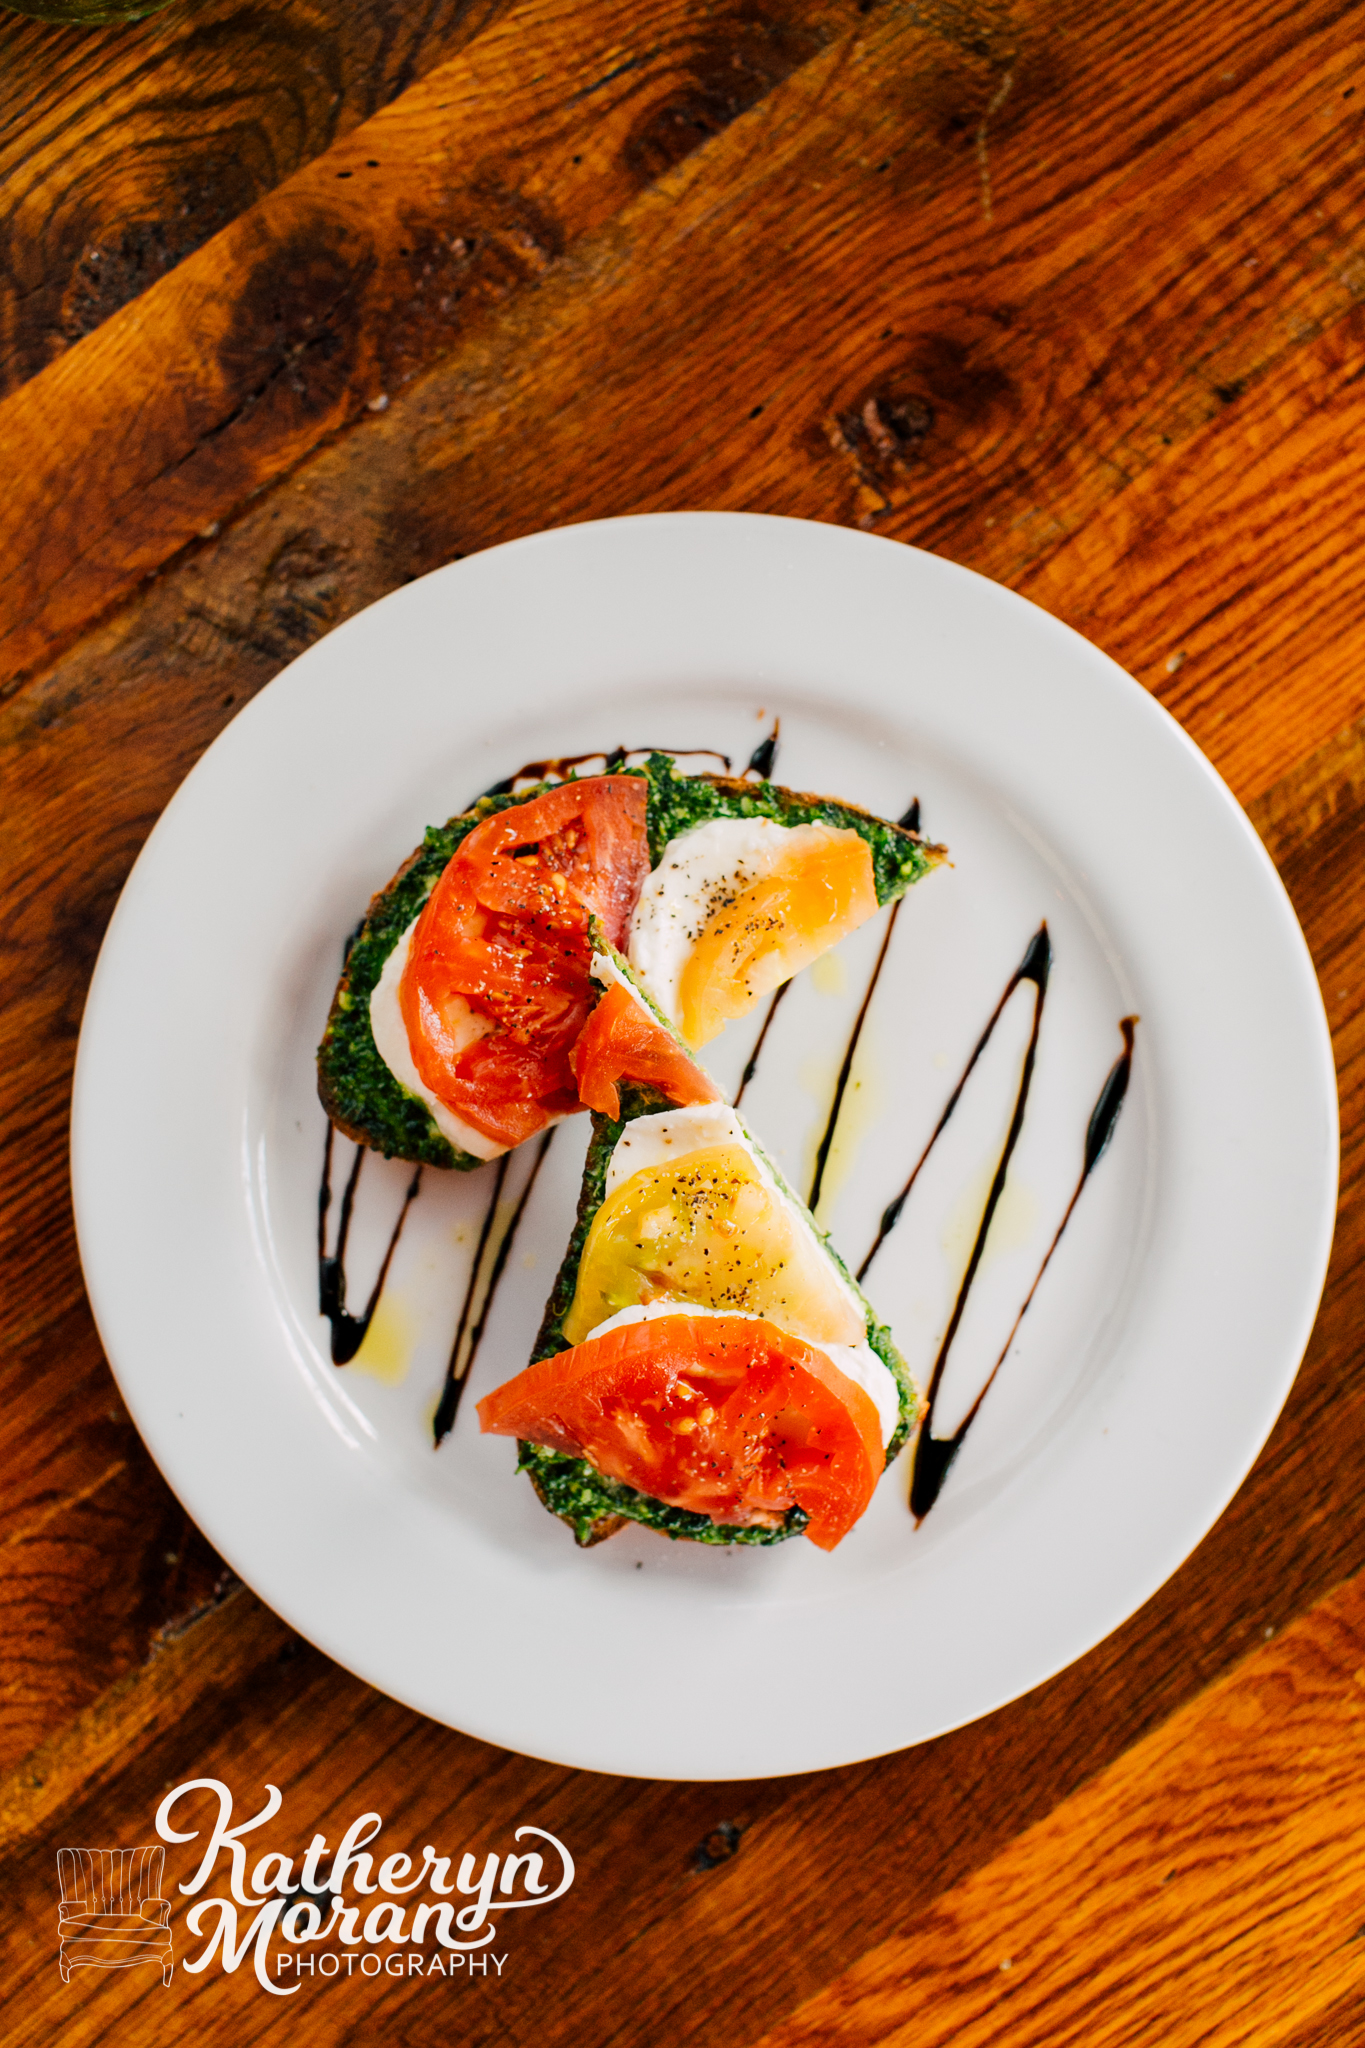 seattle-food-photographer-katheryn-moran-due-cucuina-italiana-2018-10.jpg